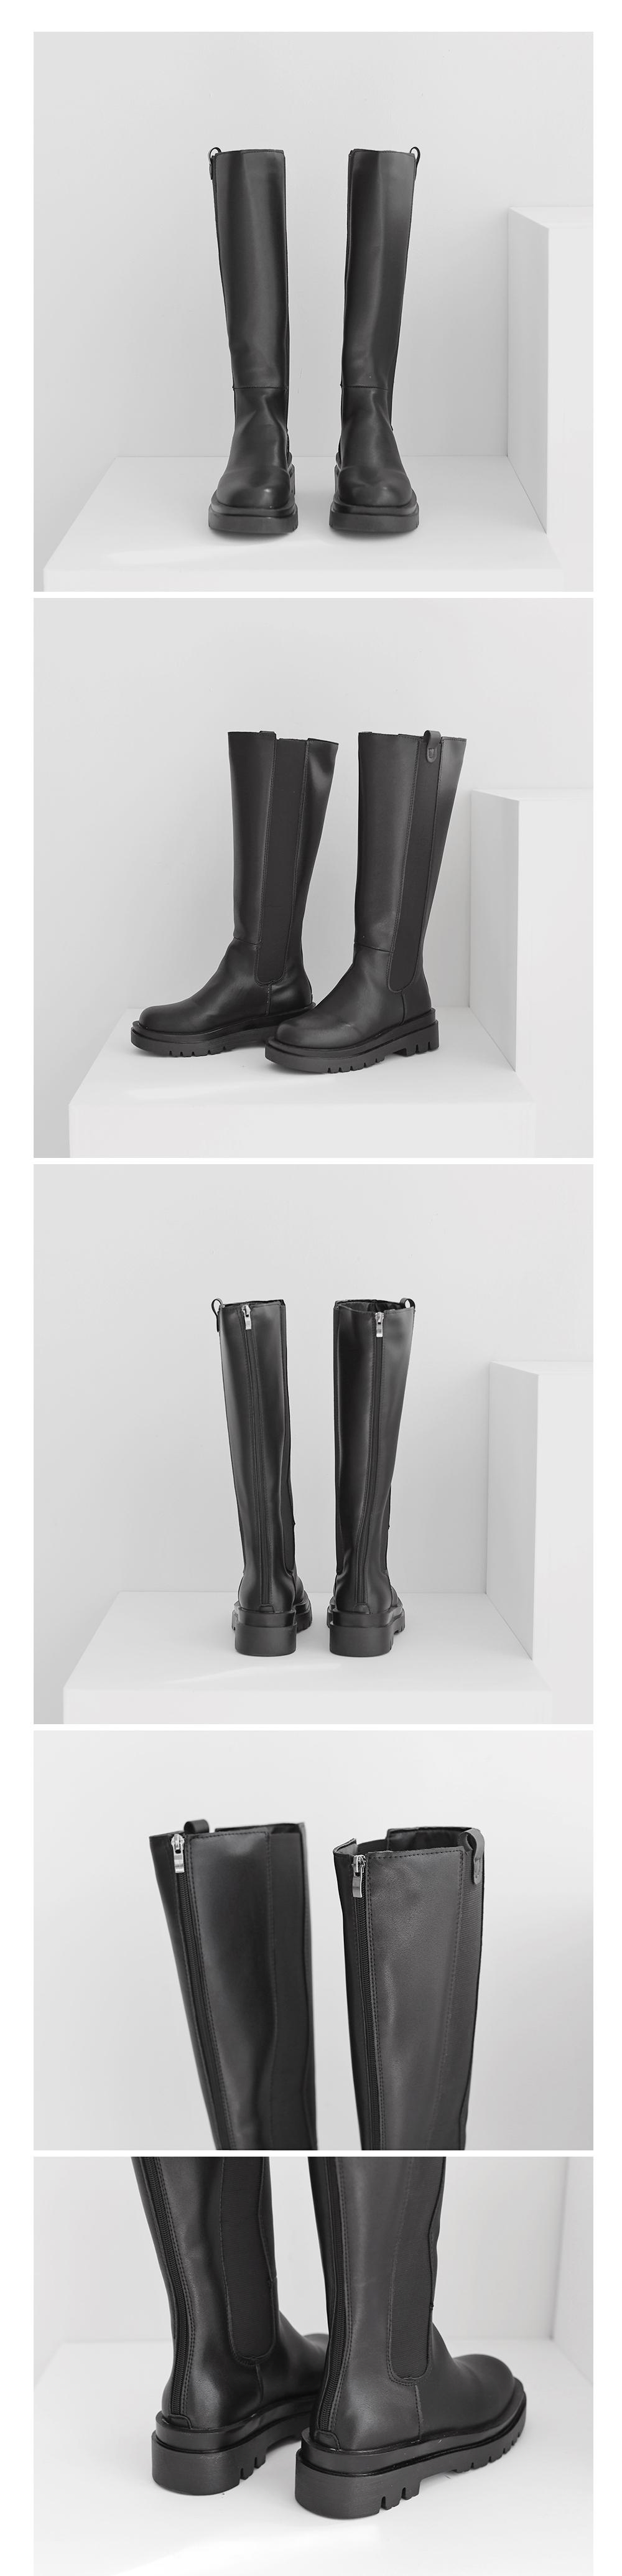 Stumpy Long Chelsea Boots